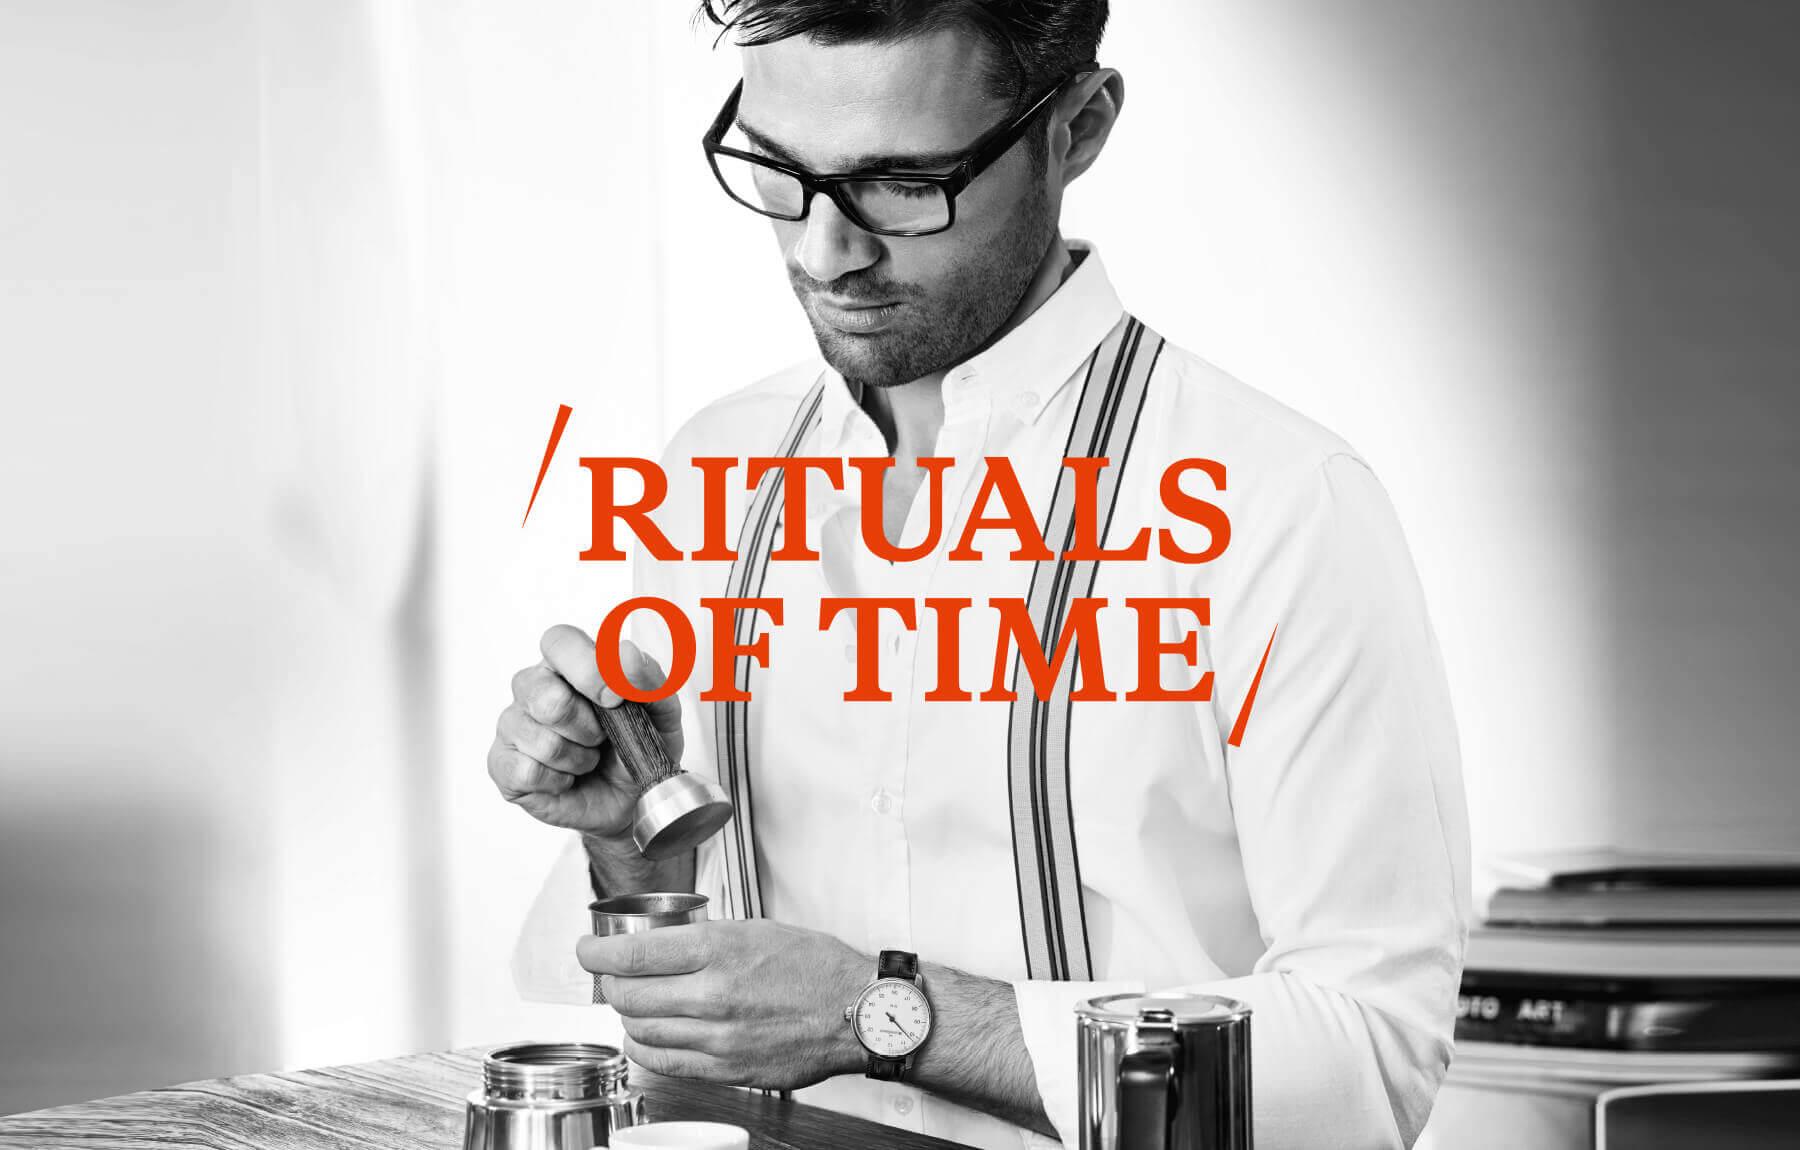 cyclos meistersinger Rituals Of Time Image Kampagne marketingkonzept marketing kreativagentur münster